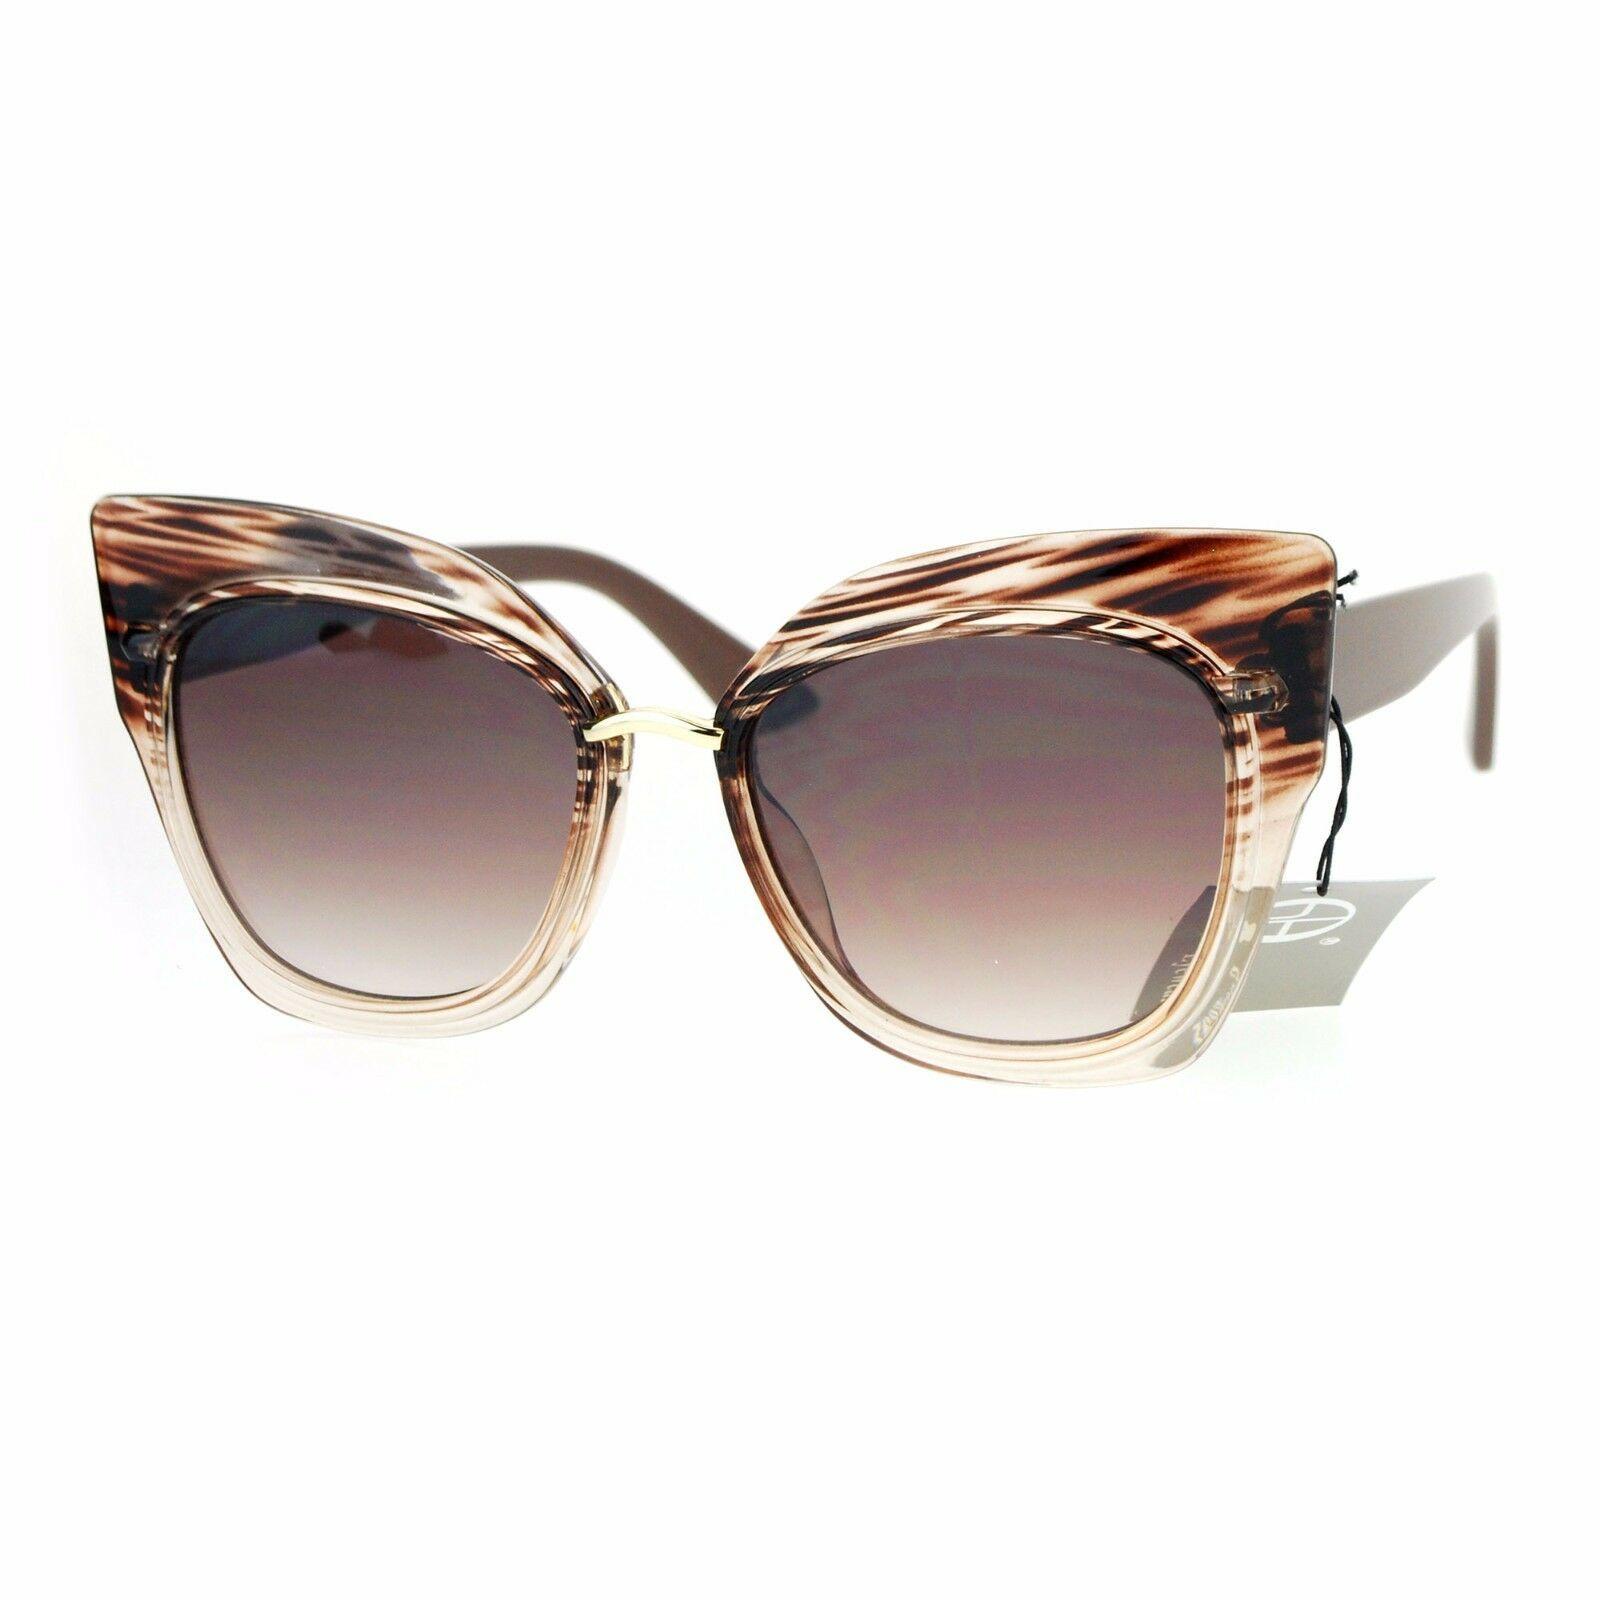 Oversized Fashion Sunglasses Womens Square Cateye Butterfly UV 400 image 2